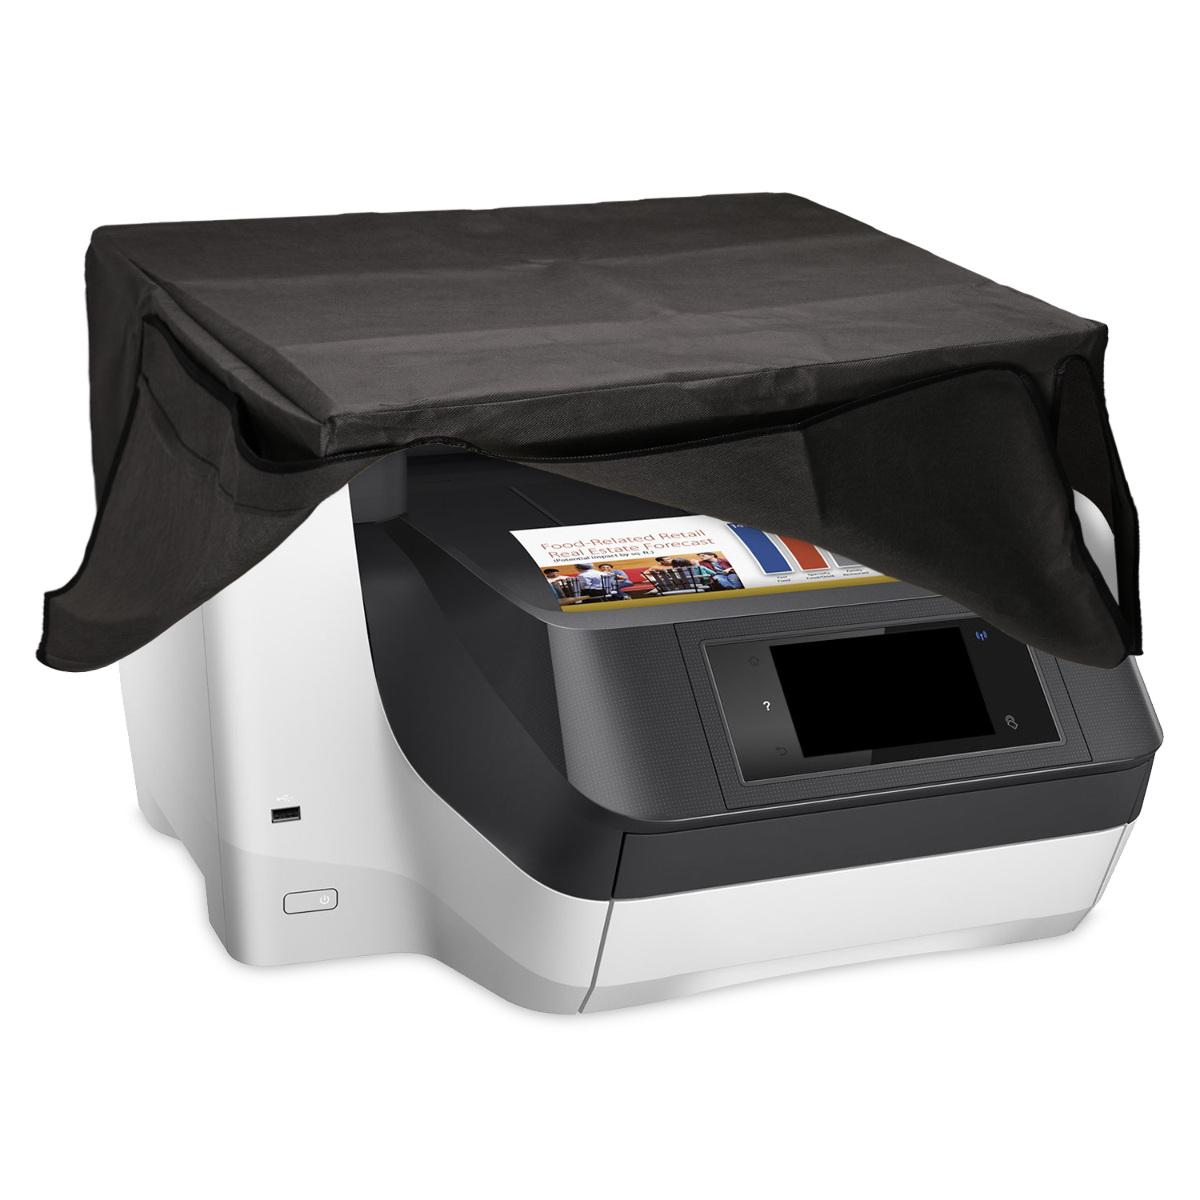 KW Κάλυμμα Εκτυπωτή HP Officejet Pro 8720/8725/8728/8730 - Dark Grey (49775.19)